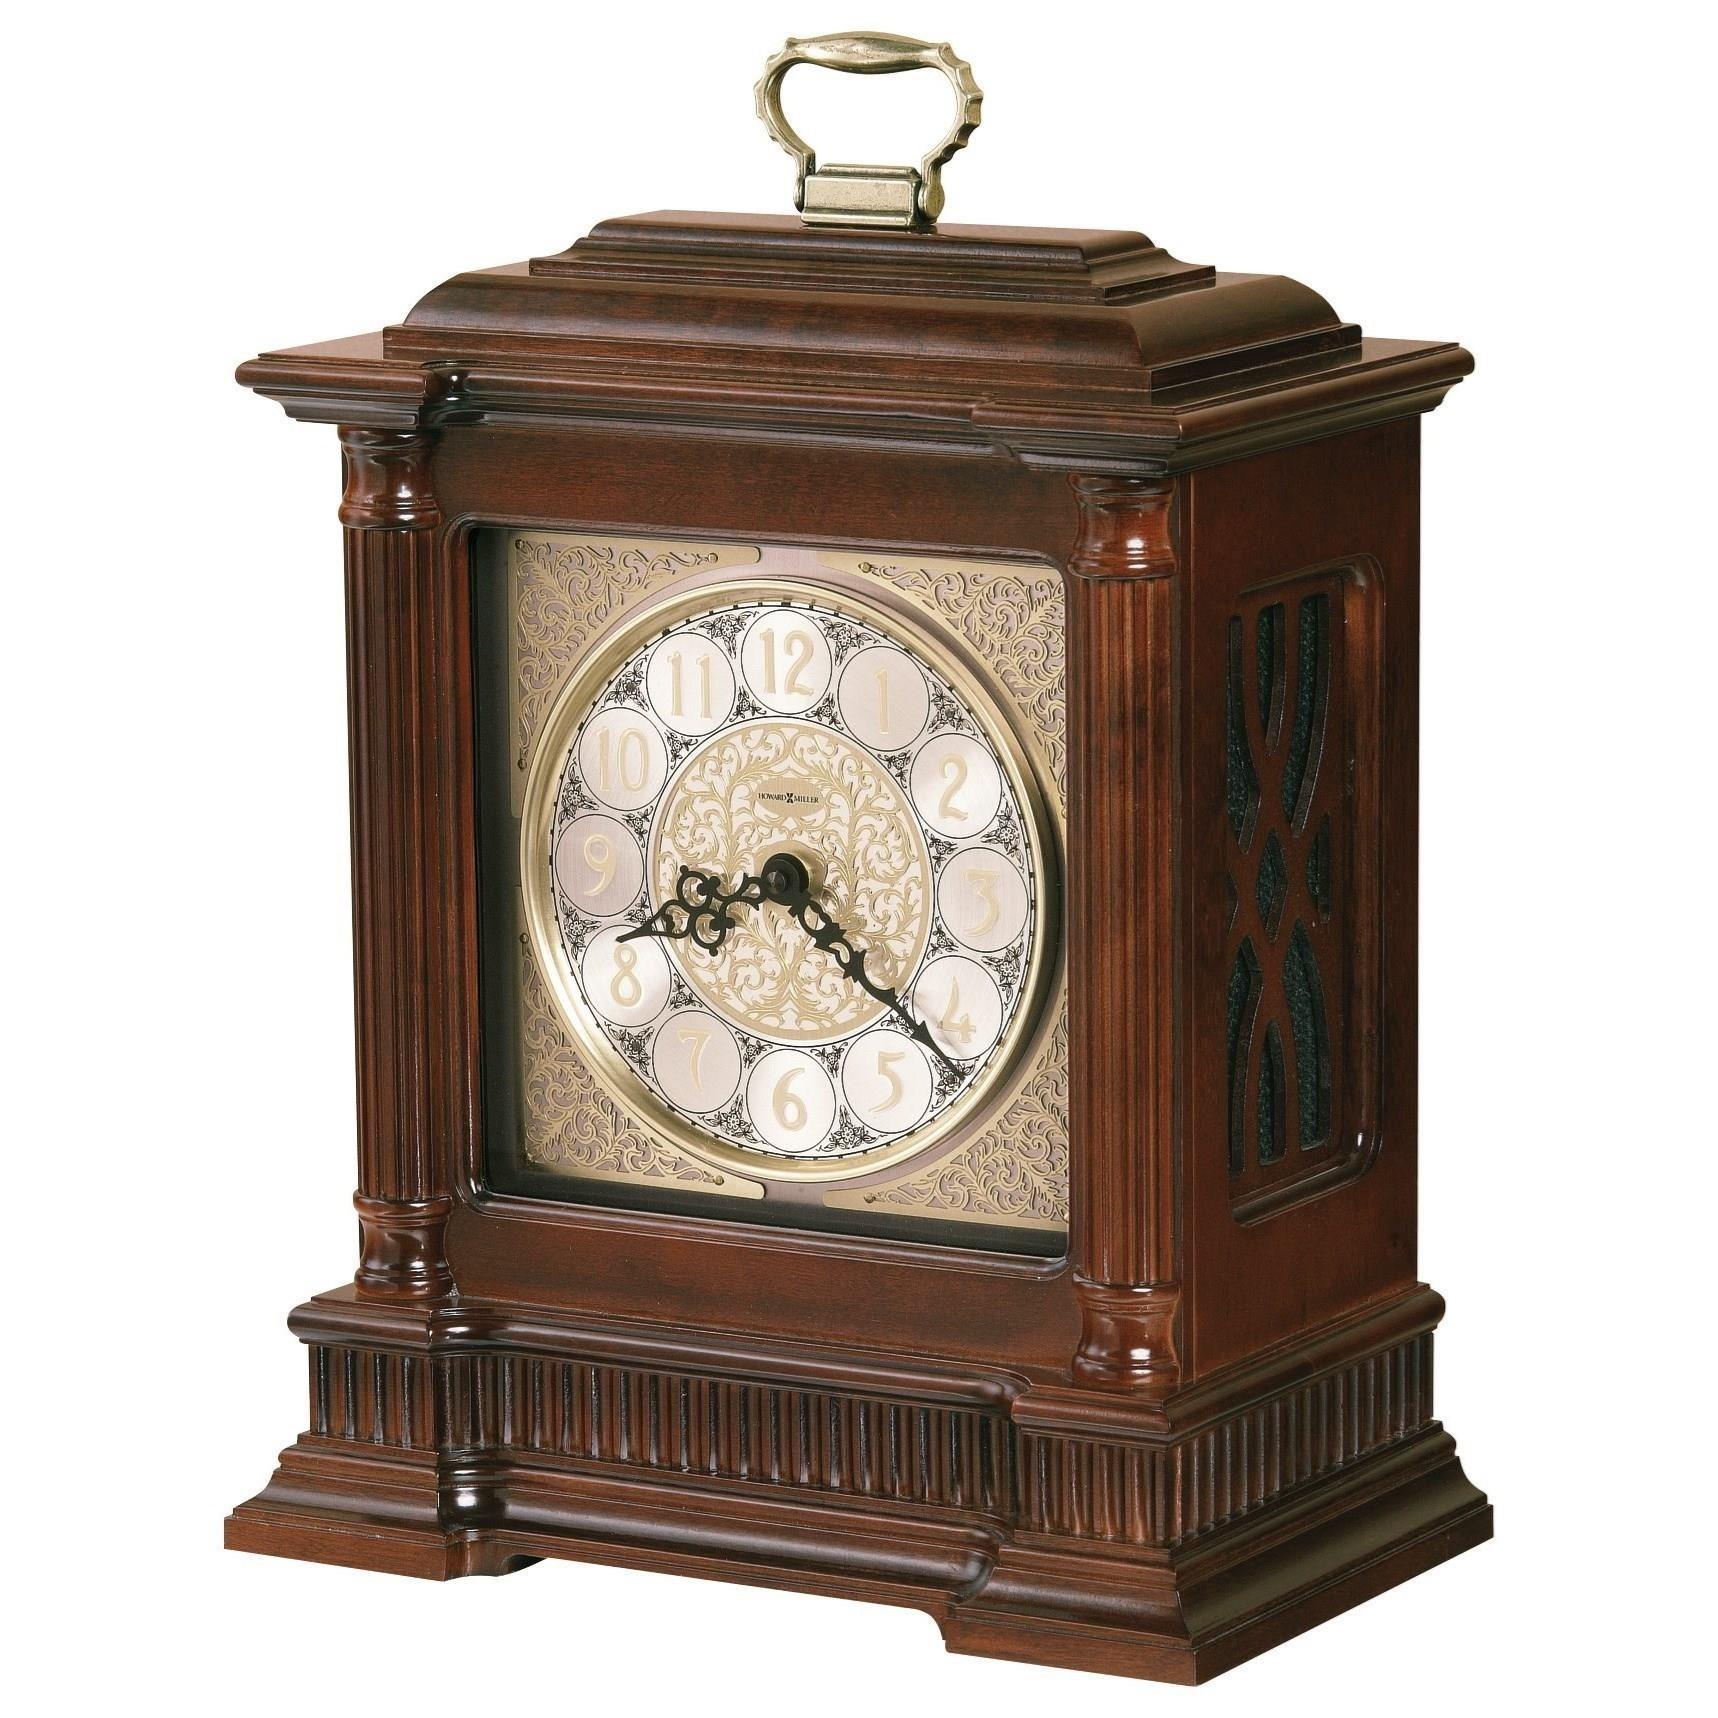 Table & Mantel Clocks Akron Mantel Clock by Howard Miller at Mueller Furniture